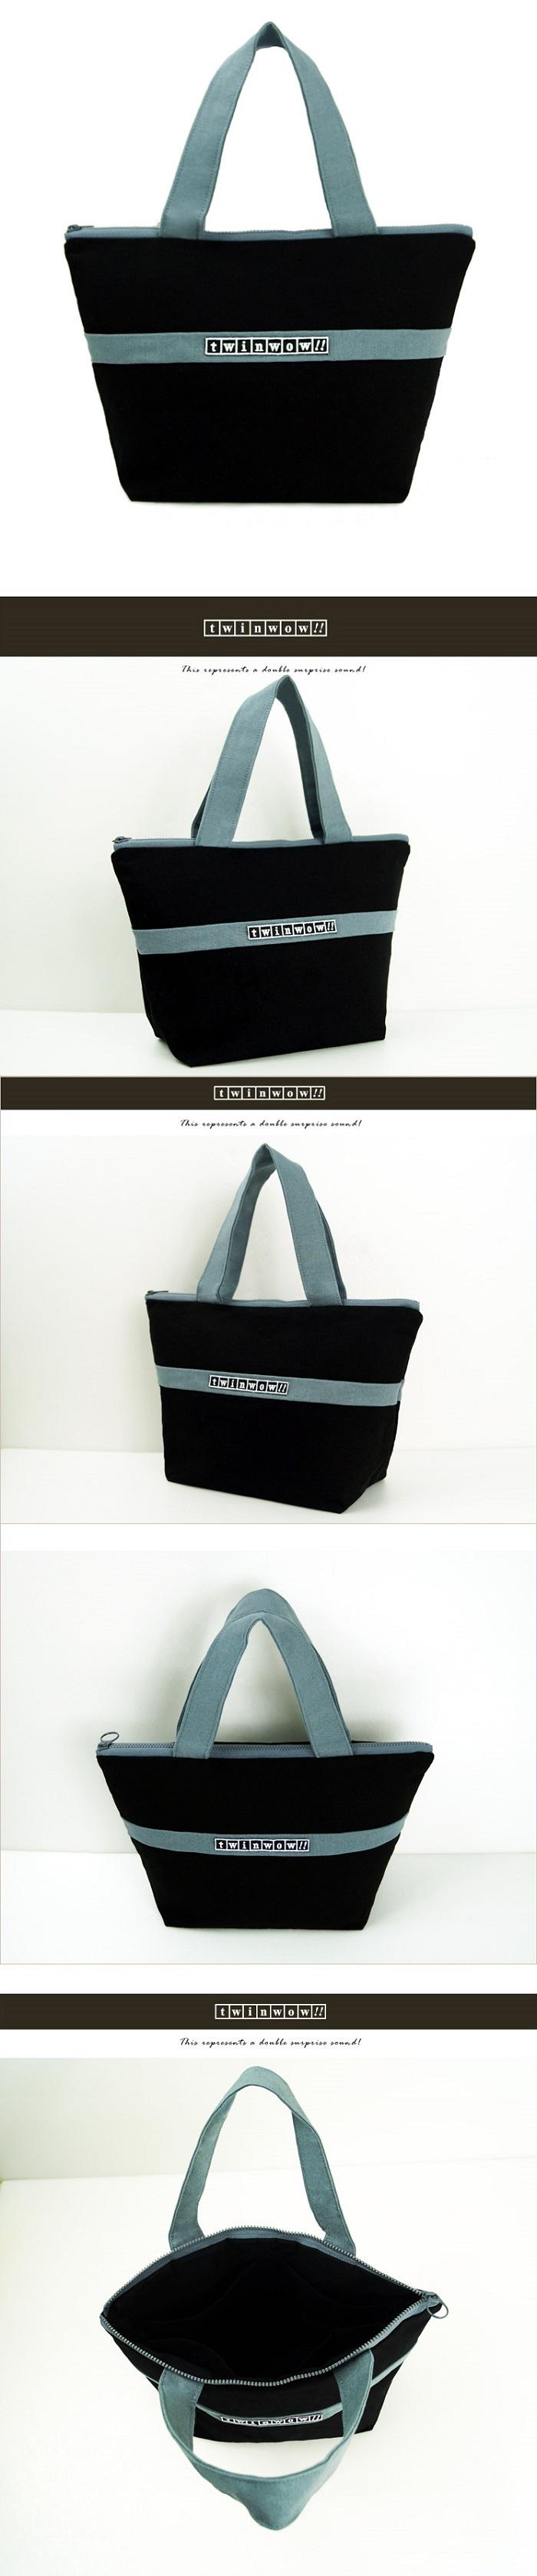 twinwow|優美典雅 - 細緻質感手提包(時尚黑灰)